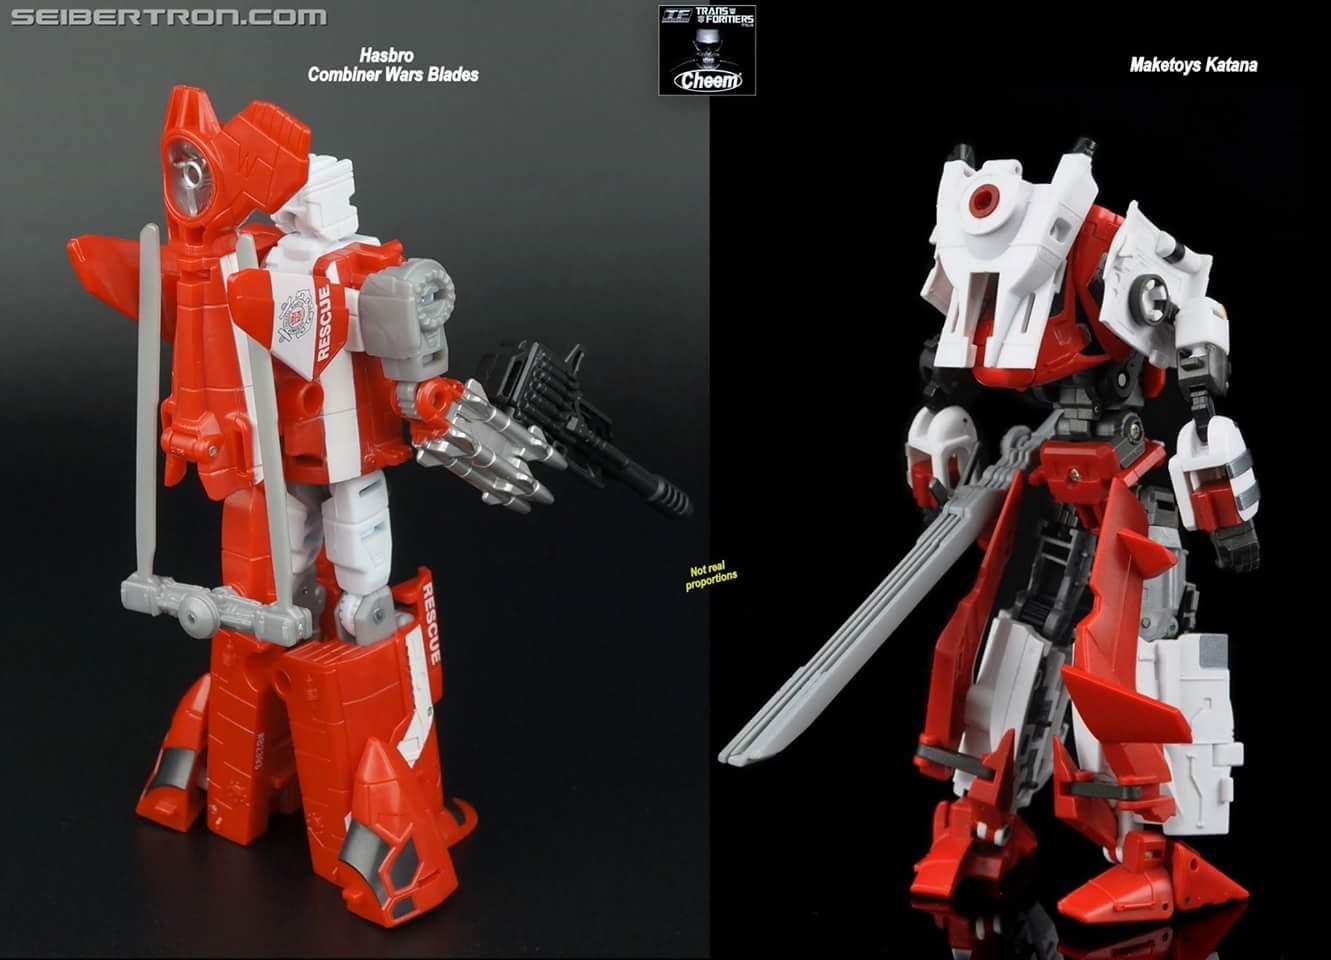 [MakeToys] Produit Tiers - Jouet MTCM-04 Guardia (aka Protectobots - Defensor/Defenso) - Page 3 A3xG0lTP